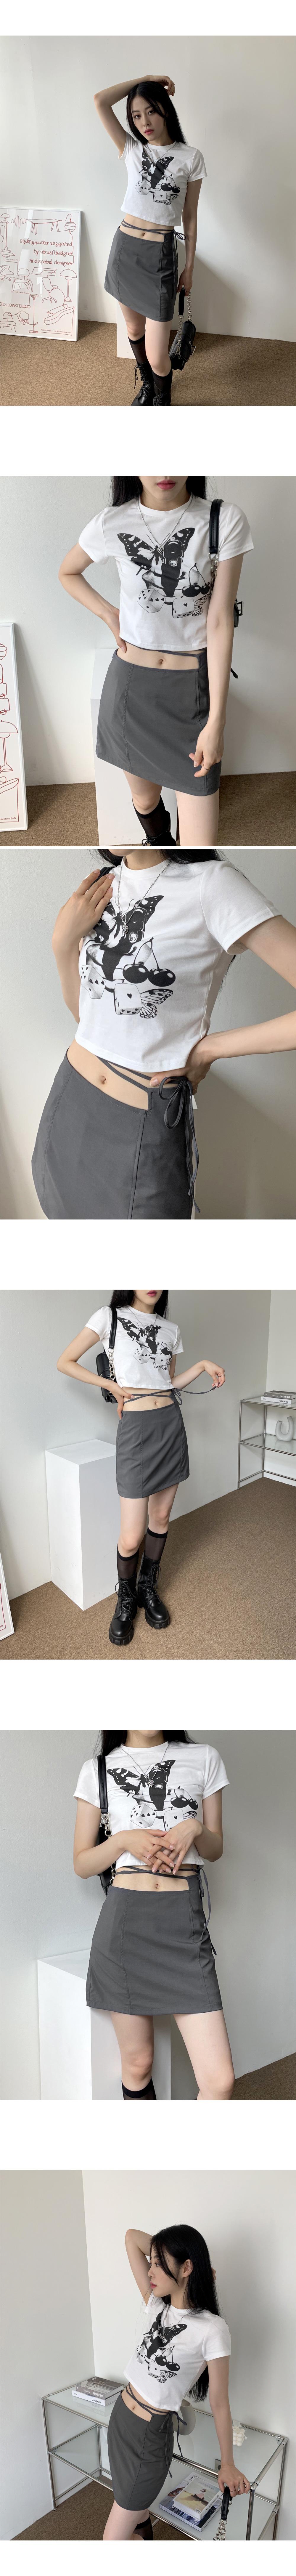 Mine Butterfly Vintage Print Crop Short Sleeve T-shirt